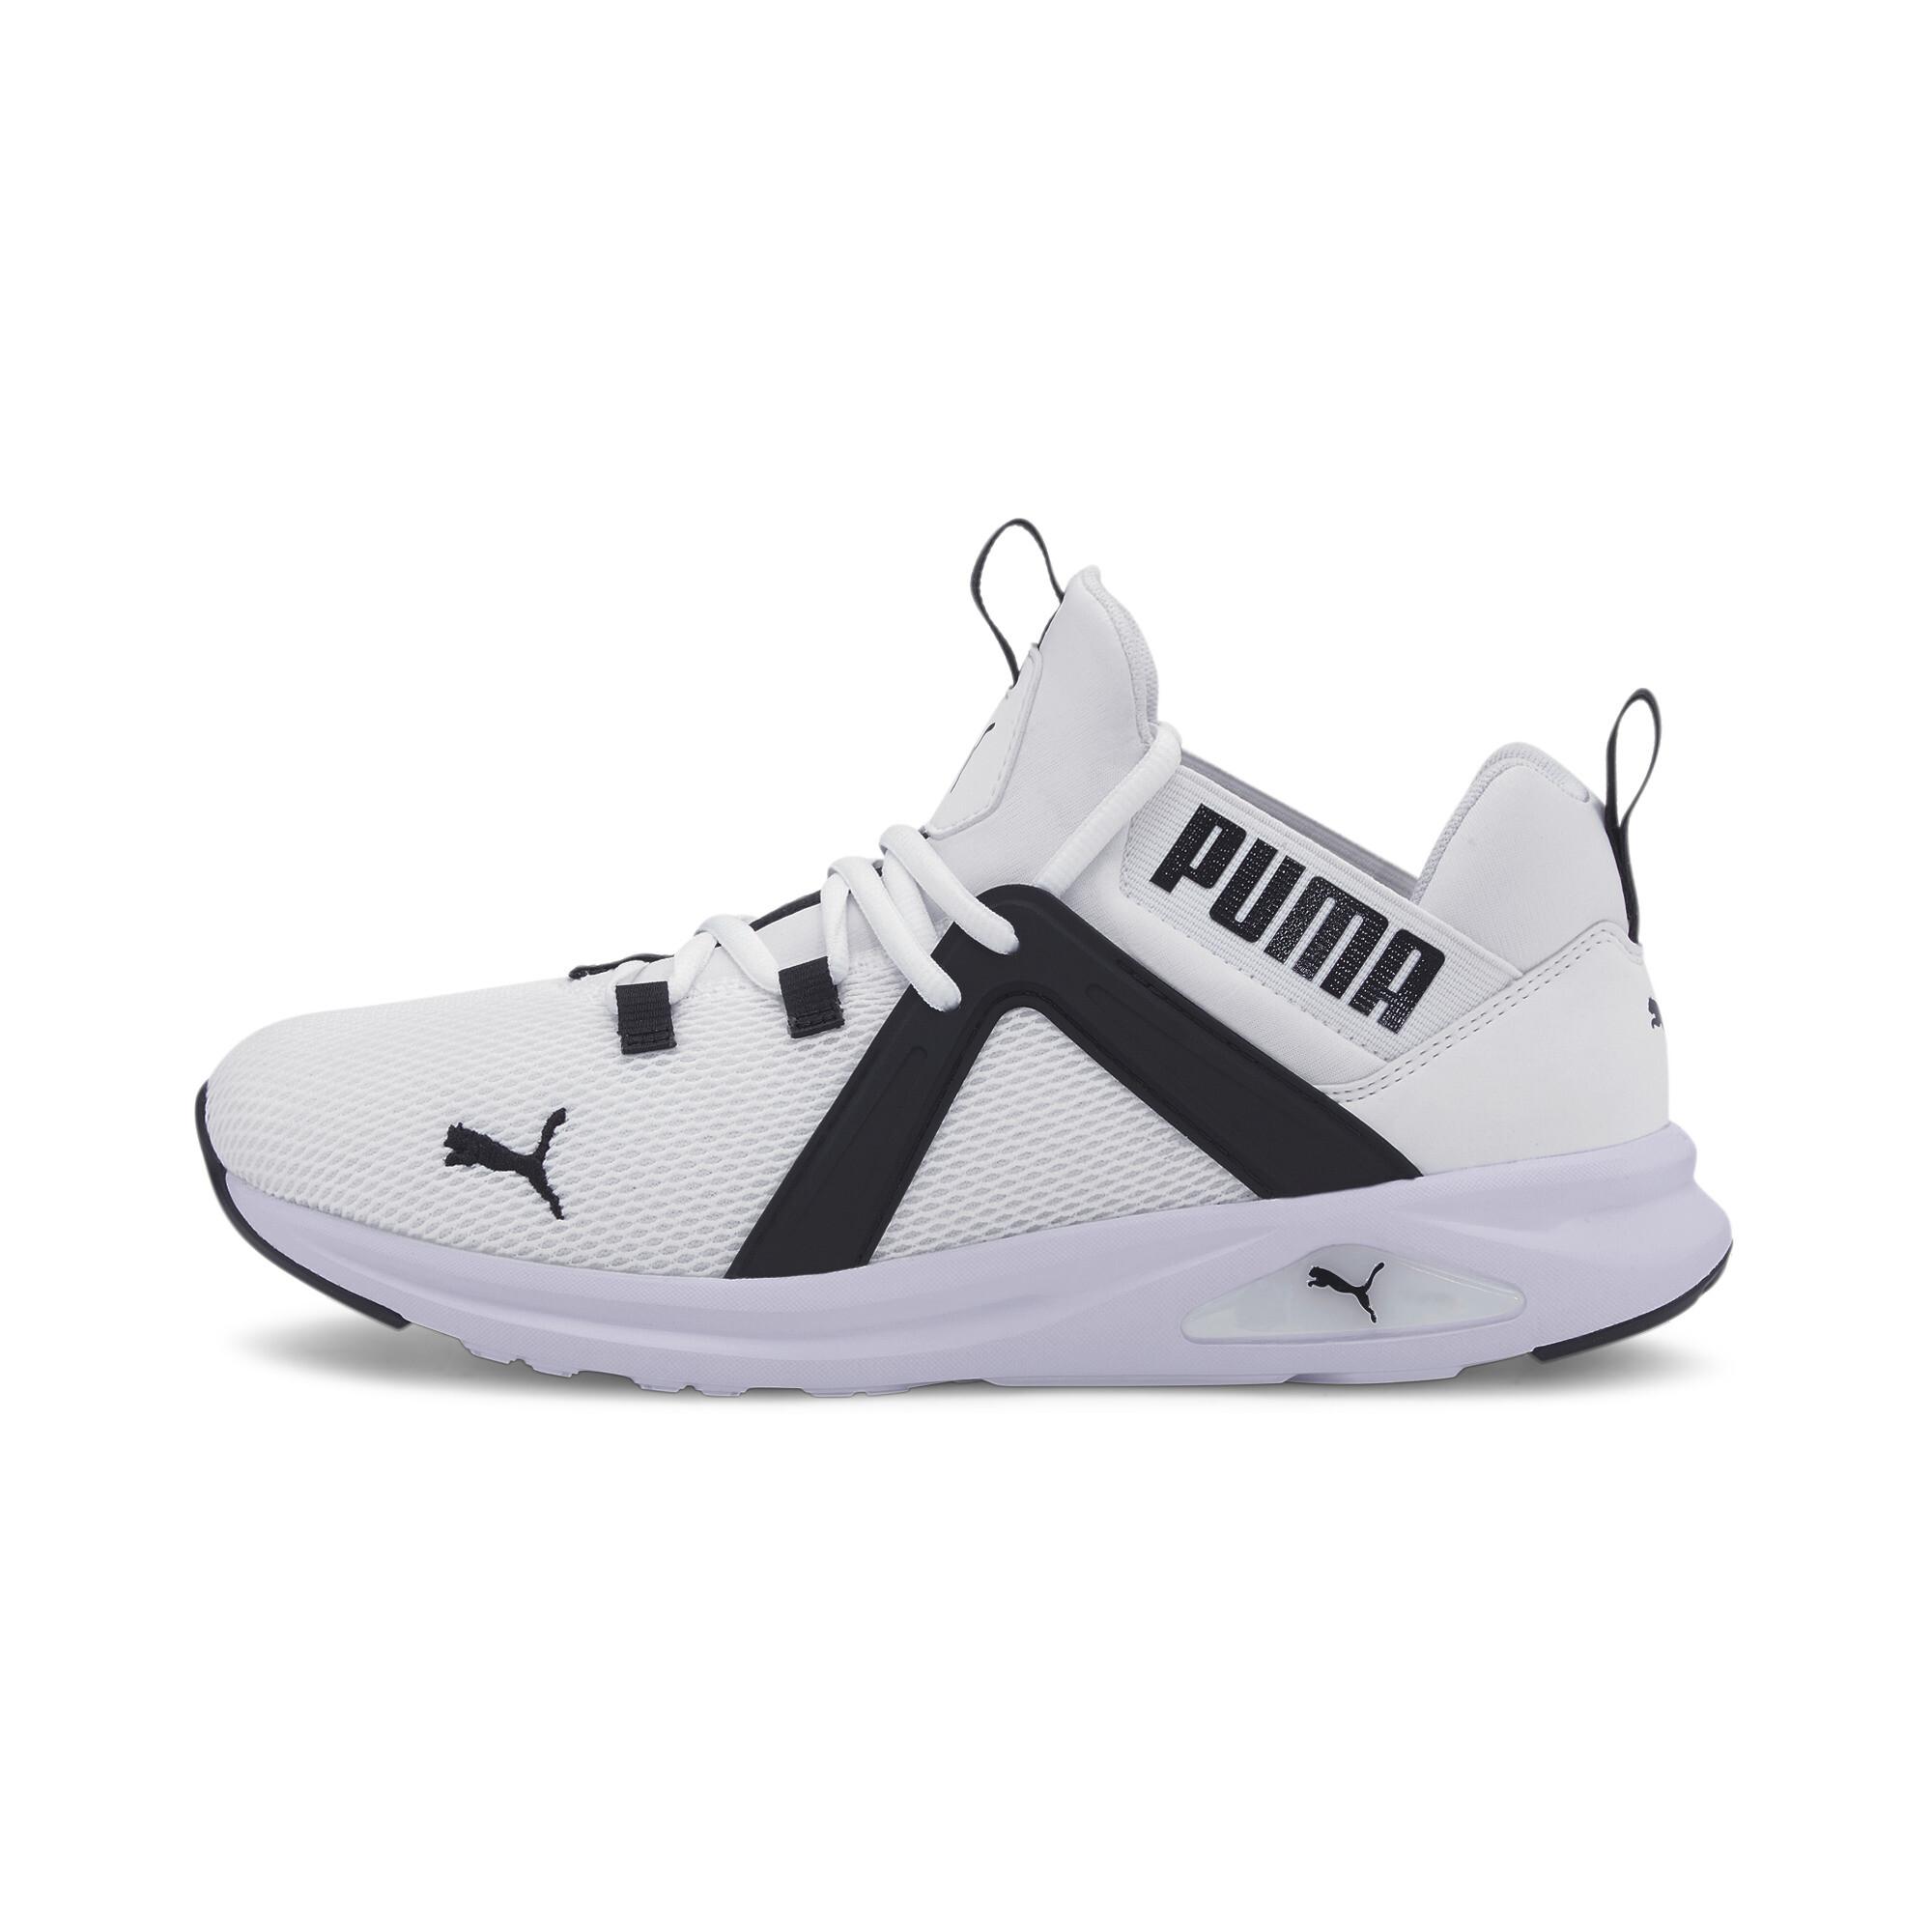 thumbnail 41 - PUMA Men's Enzo 2 Training Shoes